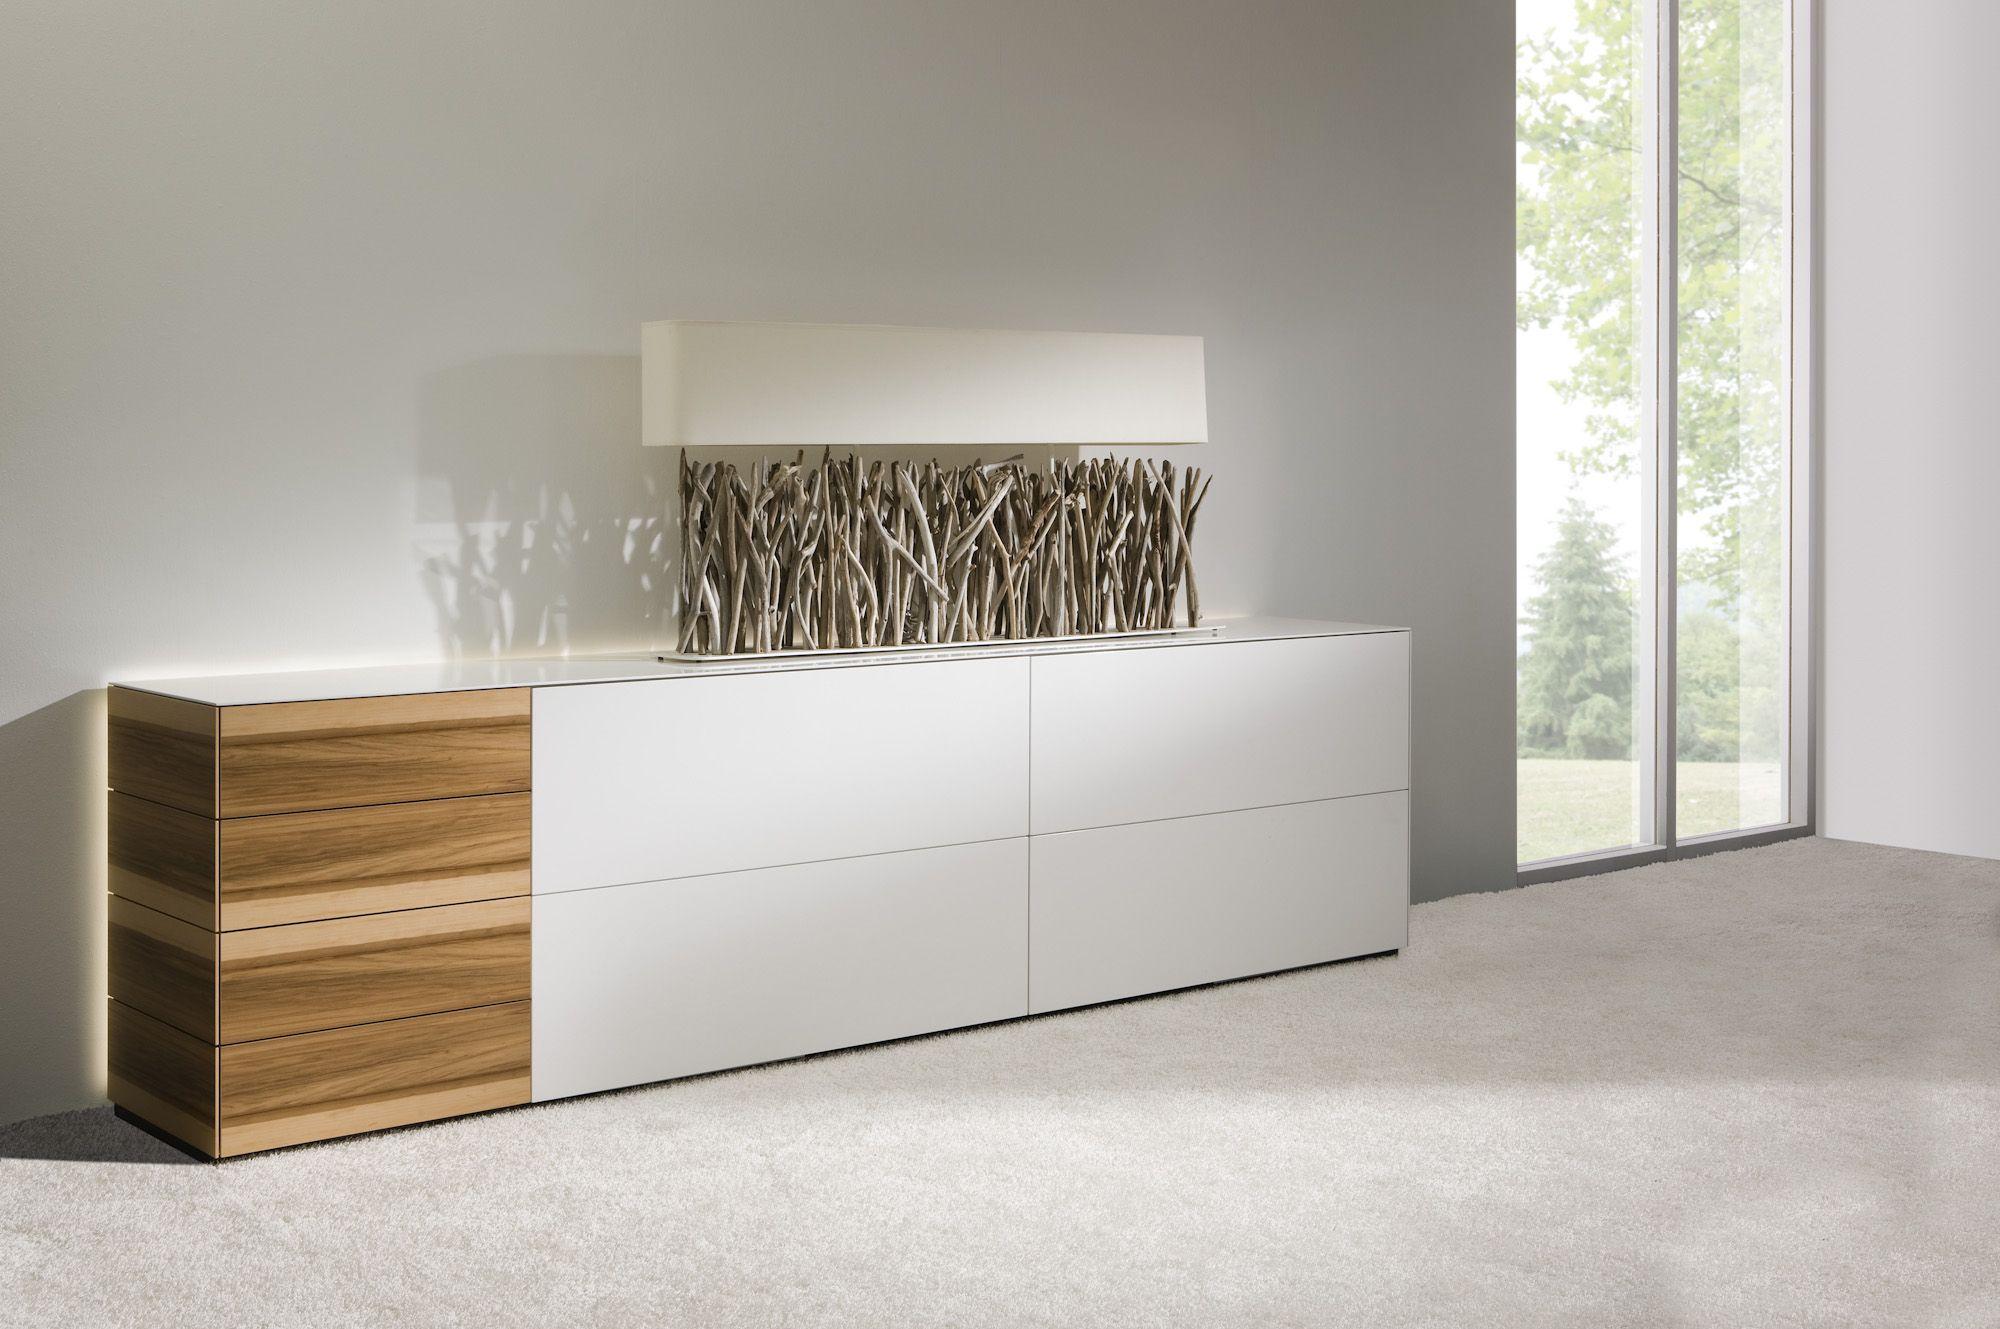 anrichte sideboard schiebet r grifflos wei holz. Black Bedroom Furniture Sets. Home Design Ideas